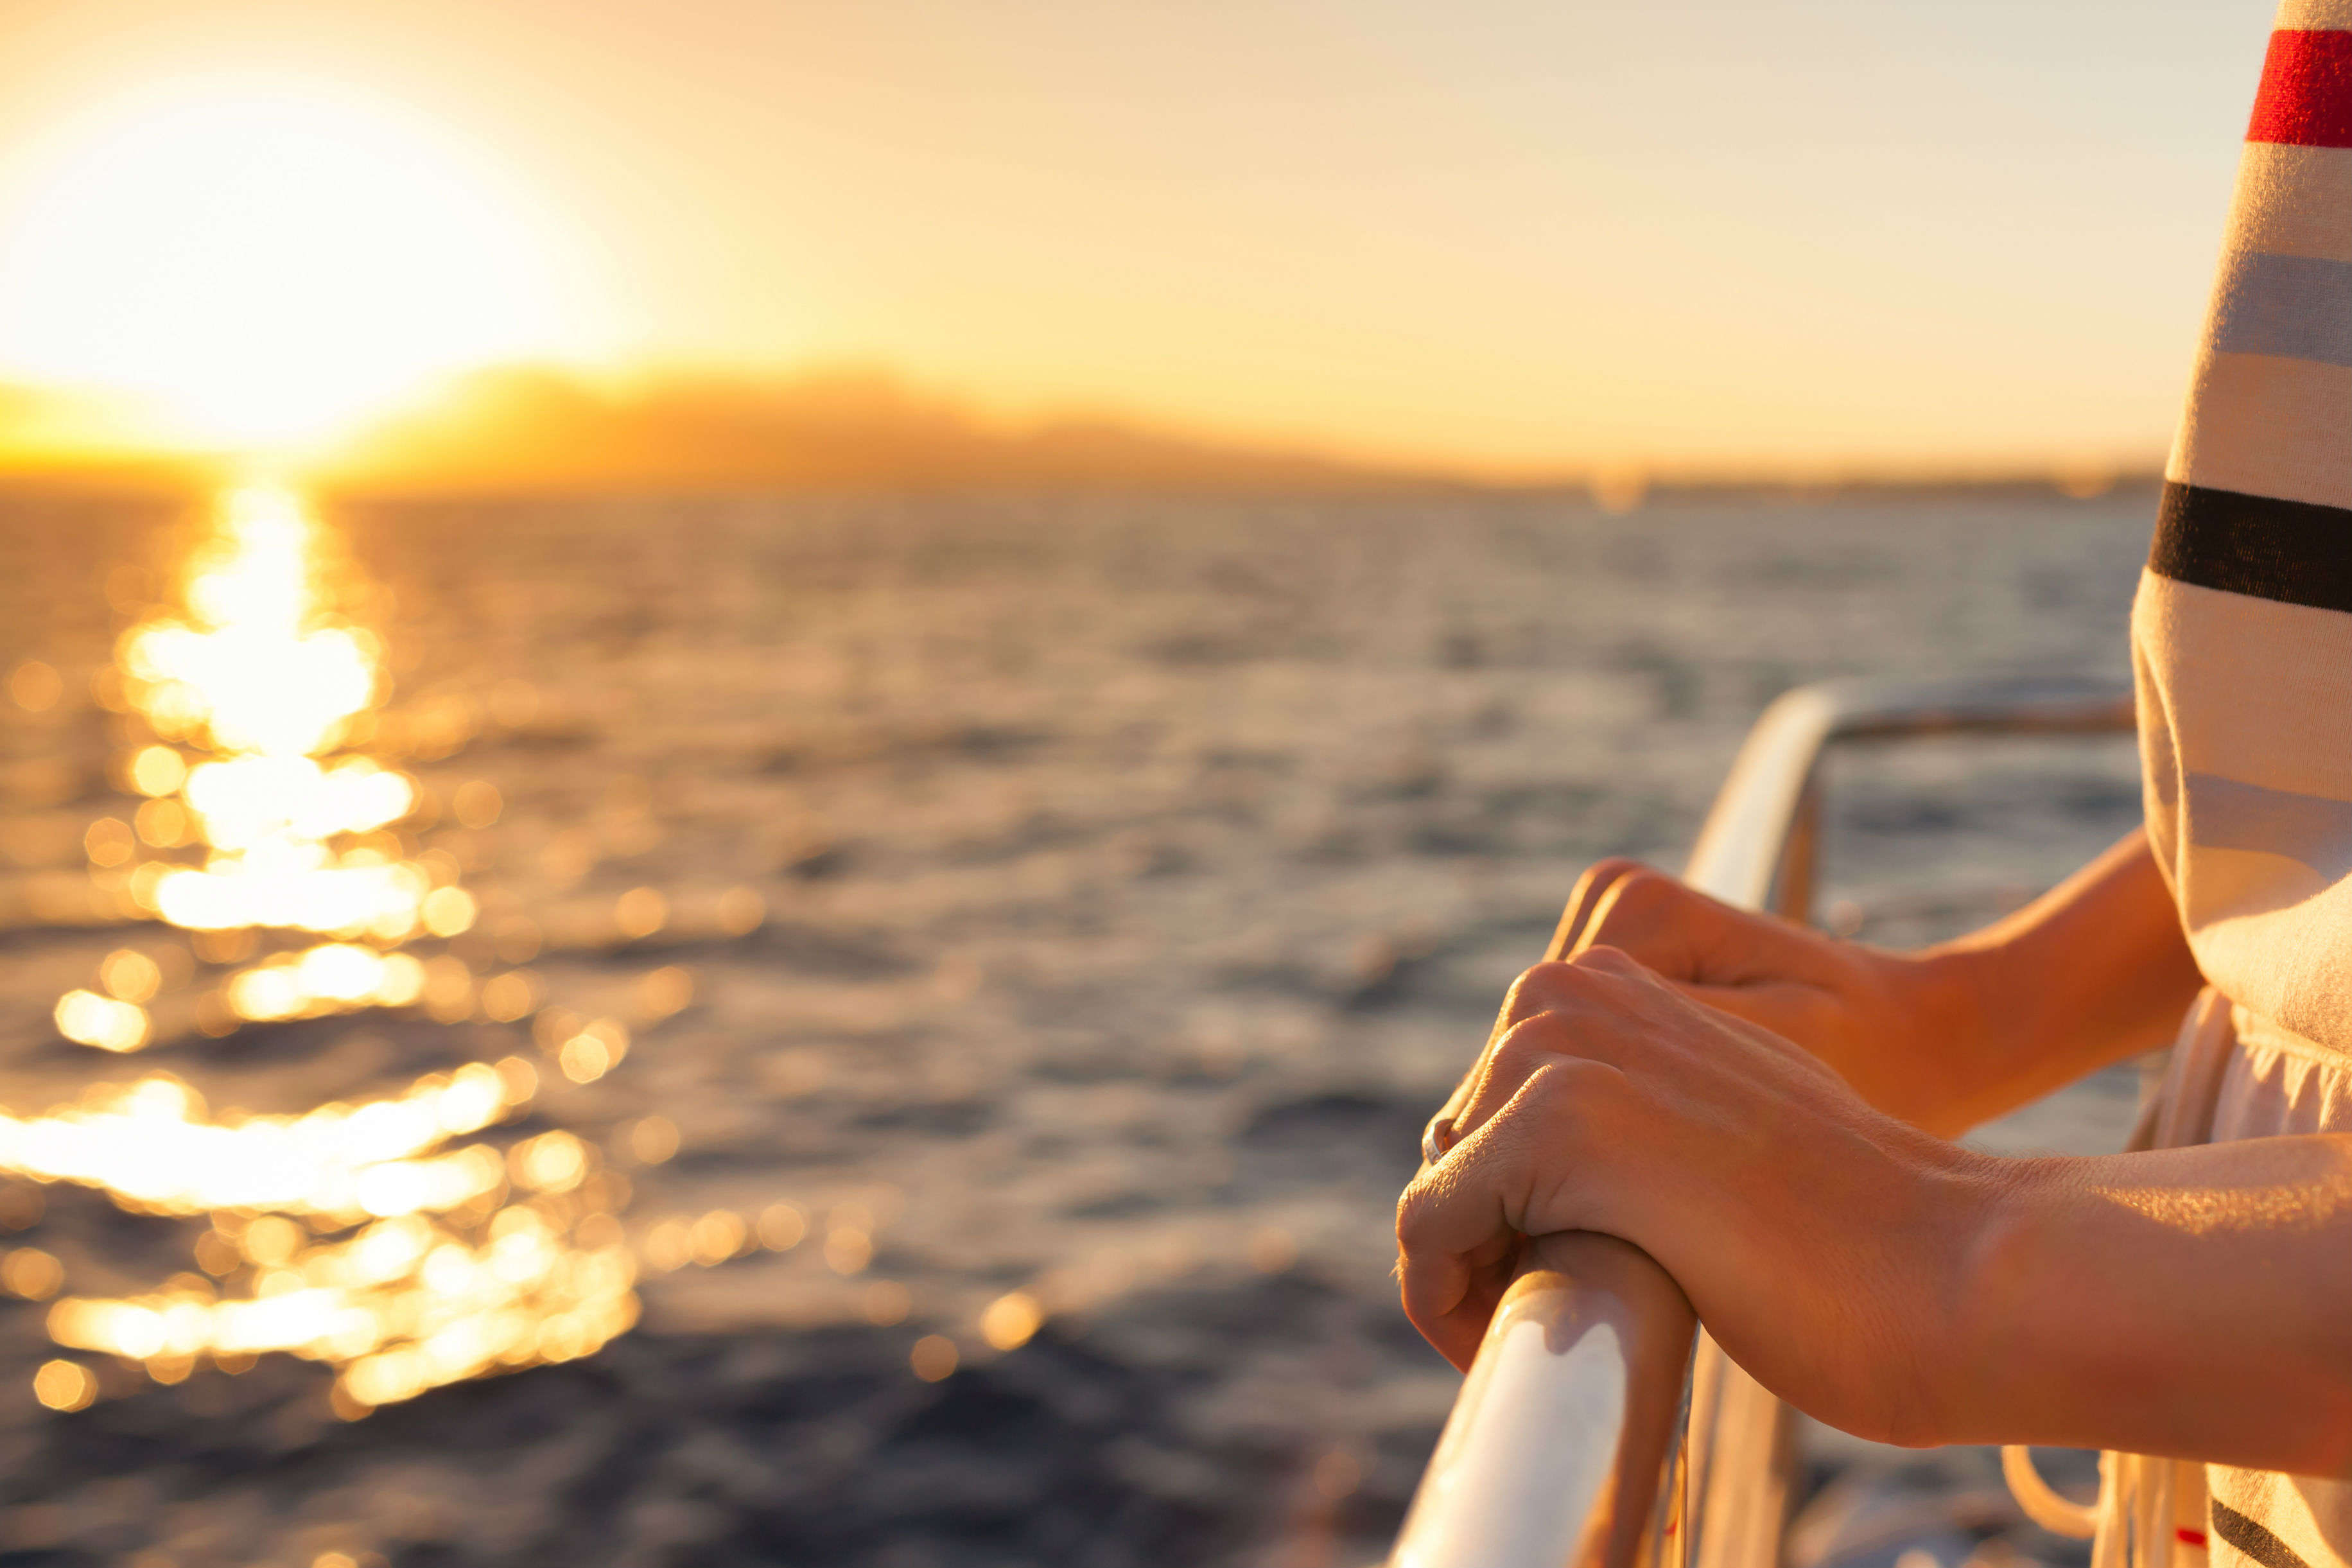 Ahoy! Now take a cruise ship between Mumbai and Goa